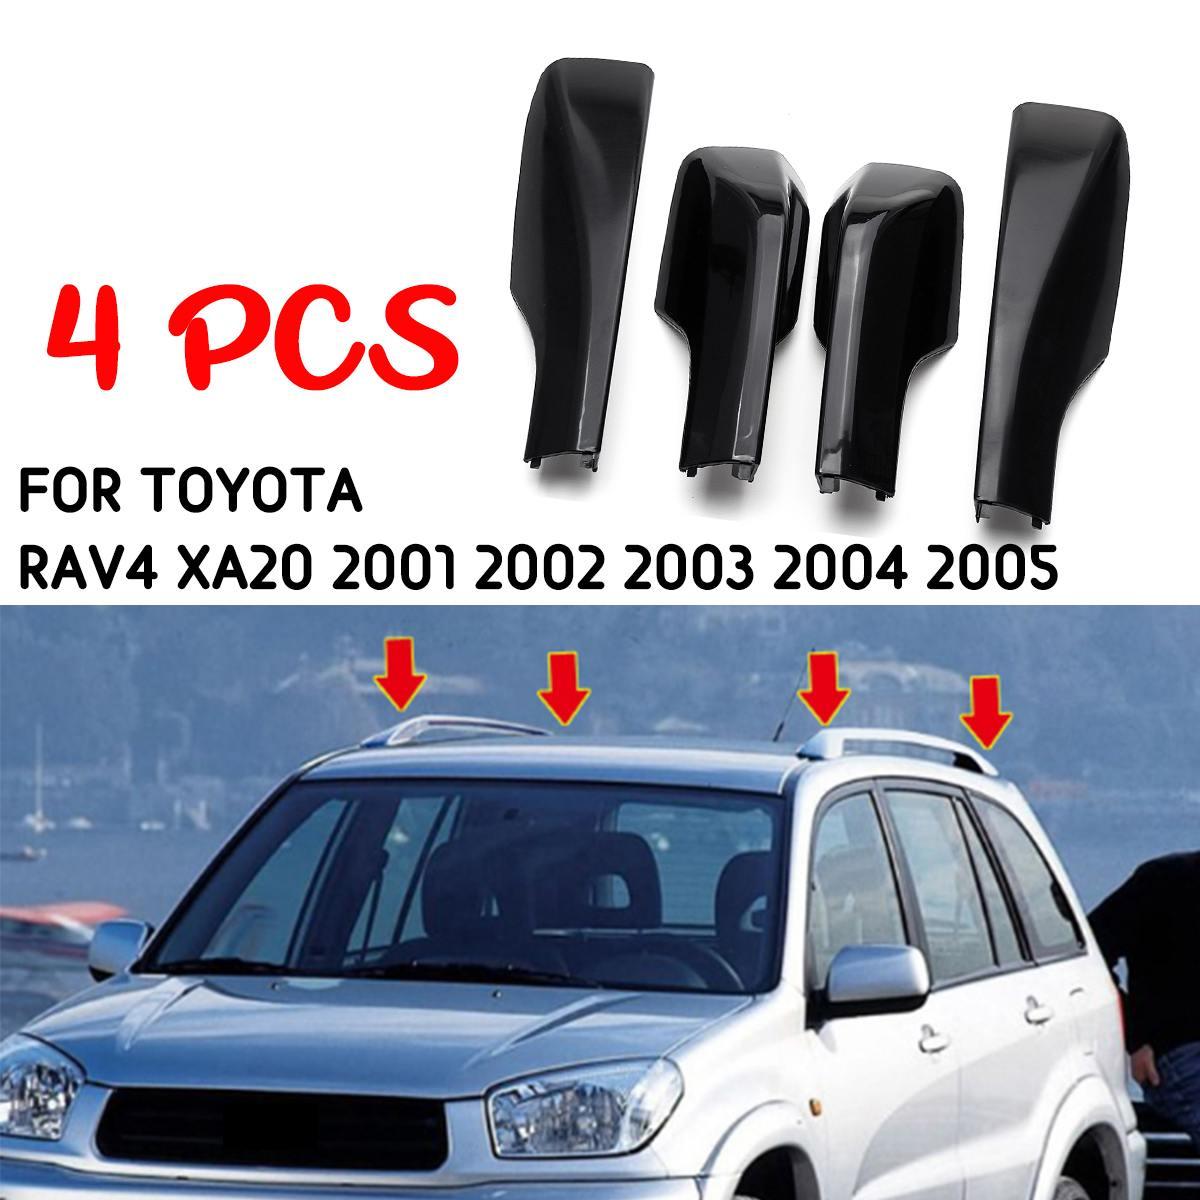 4 pcs substituicao para toyota rav4 xa20 2001 2002 2003 2004 2005 estilo do carro preto